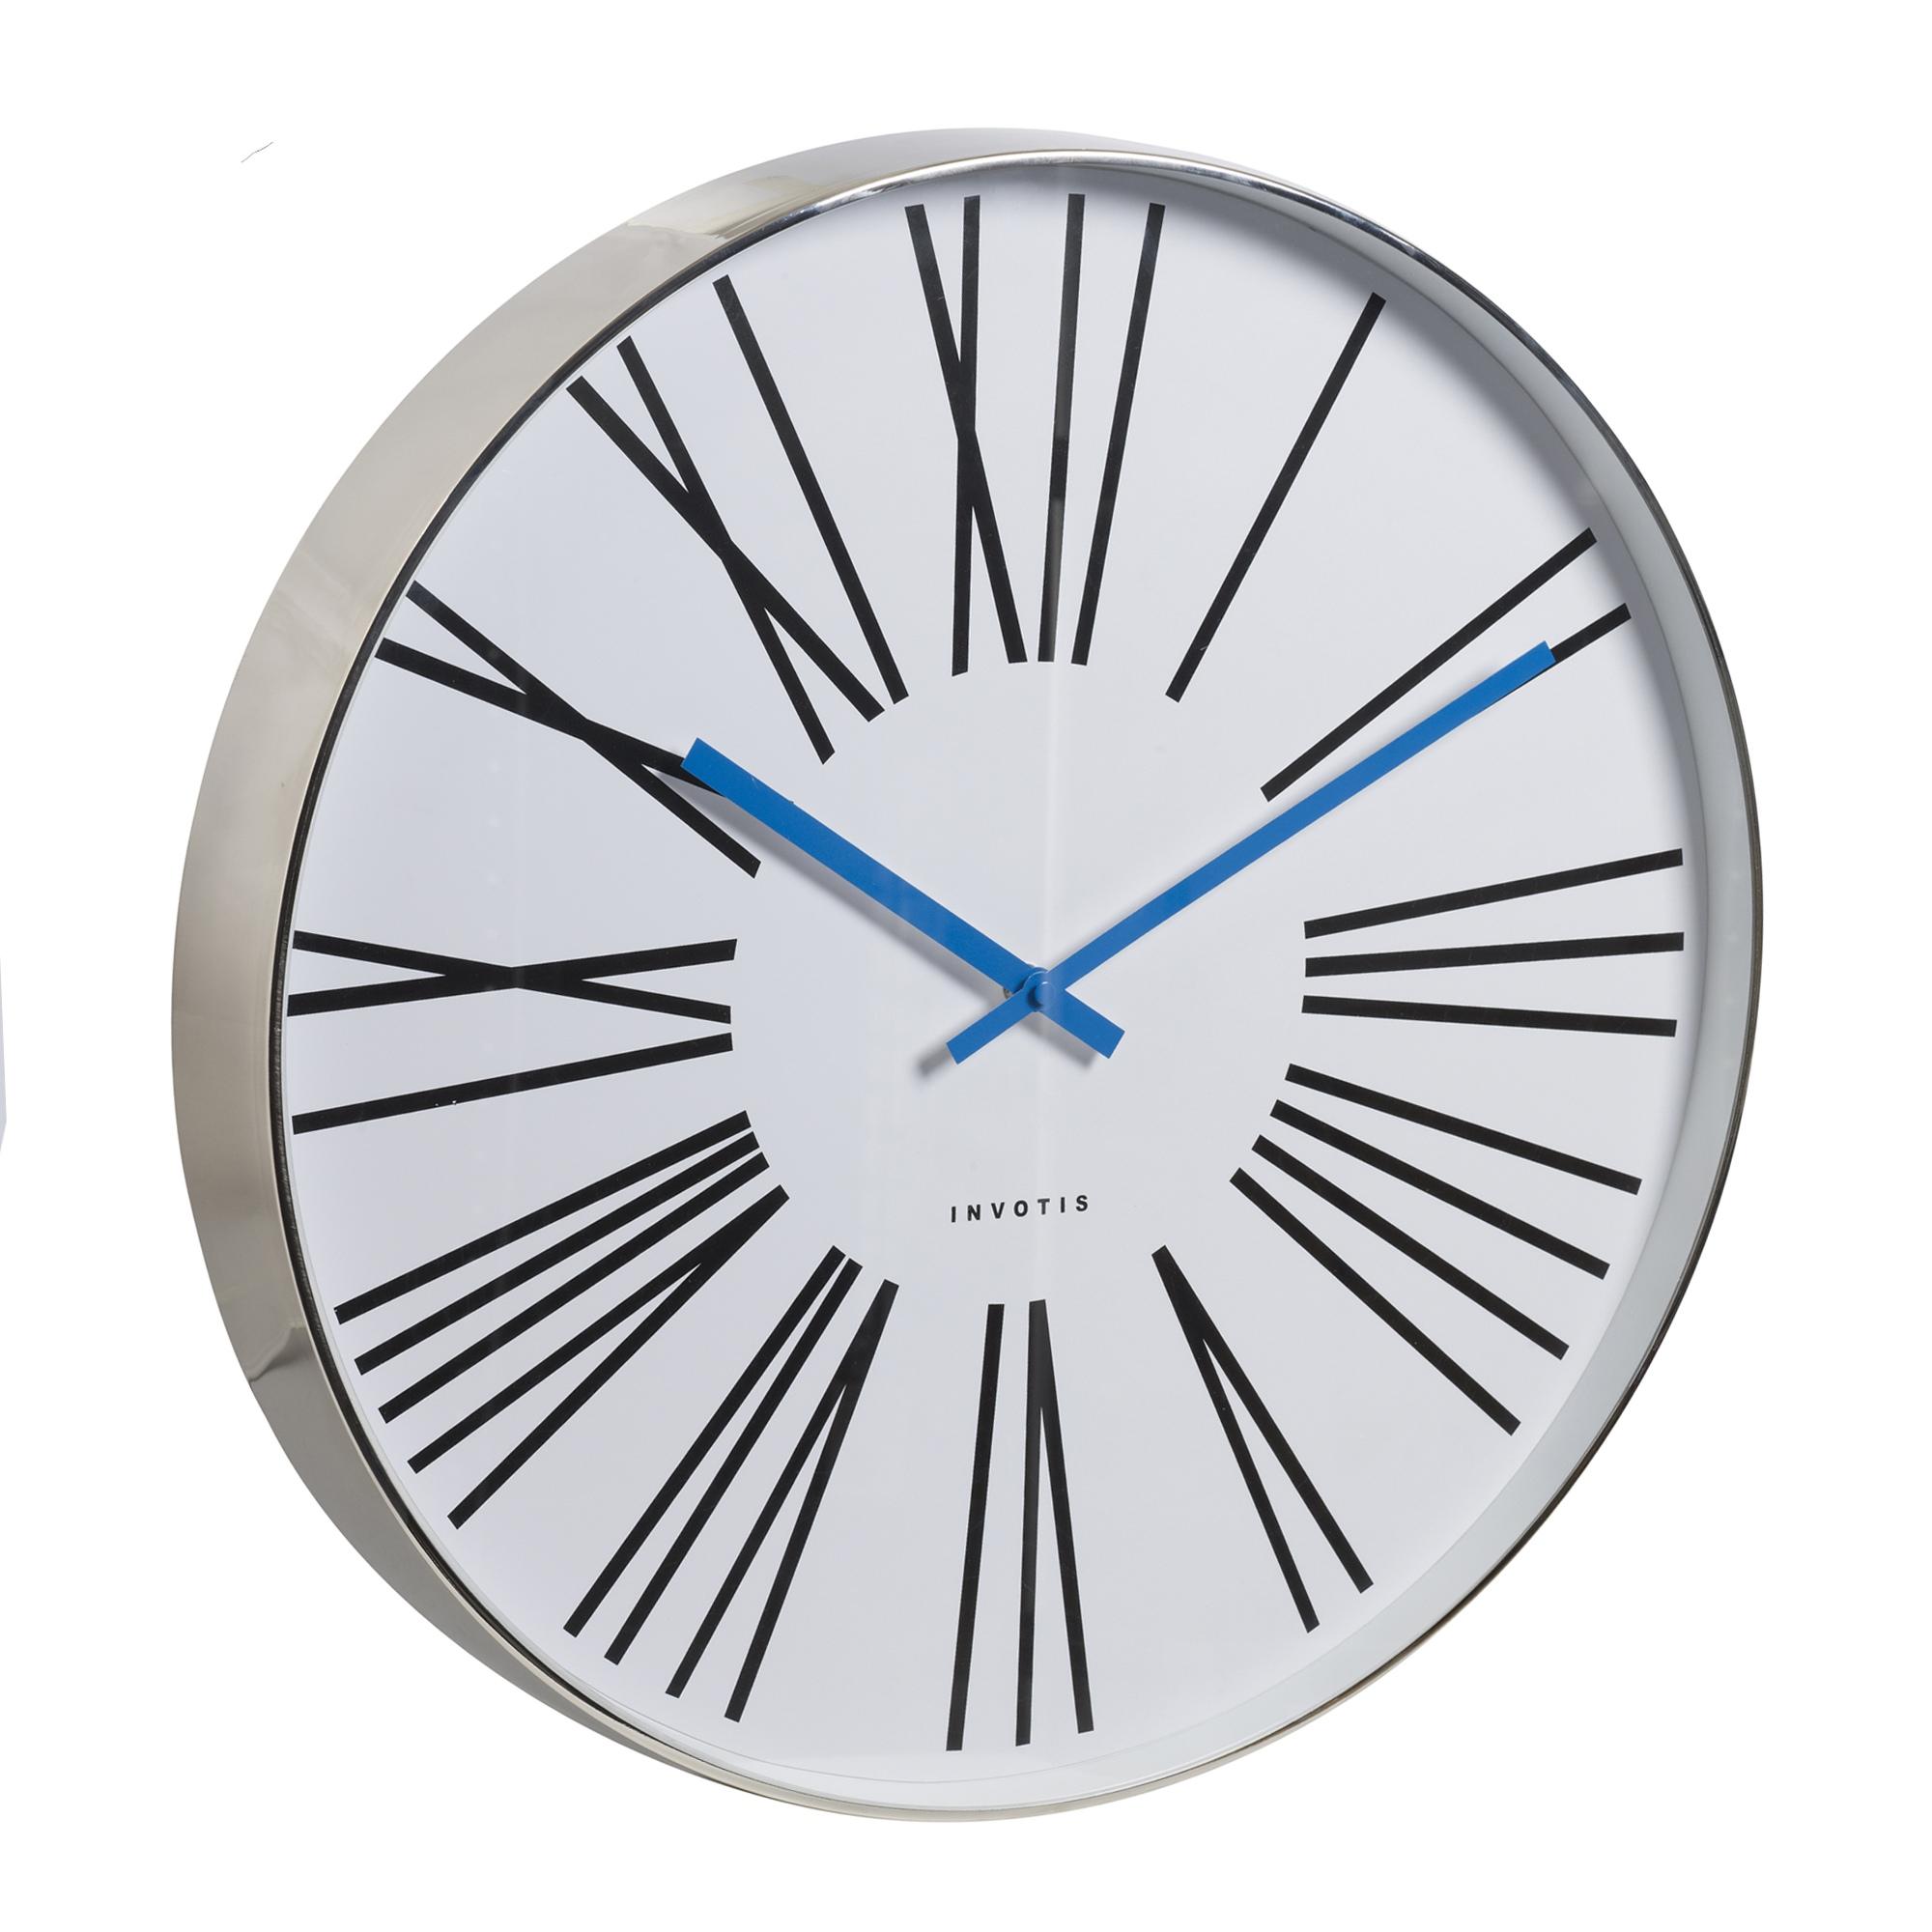 Invotis large 50cm chrome case wall clock roman numerals blue item specifics amipublicfo Gallery